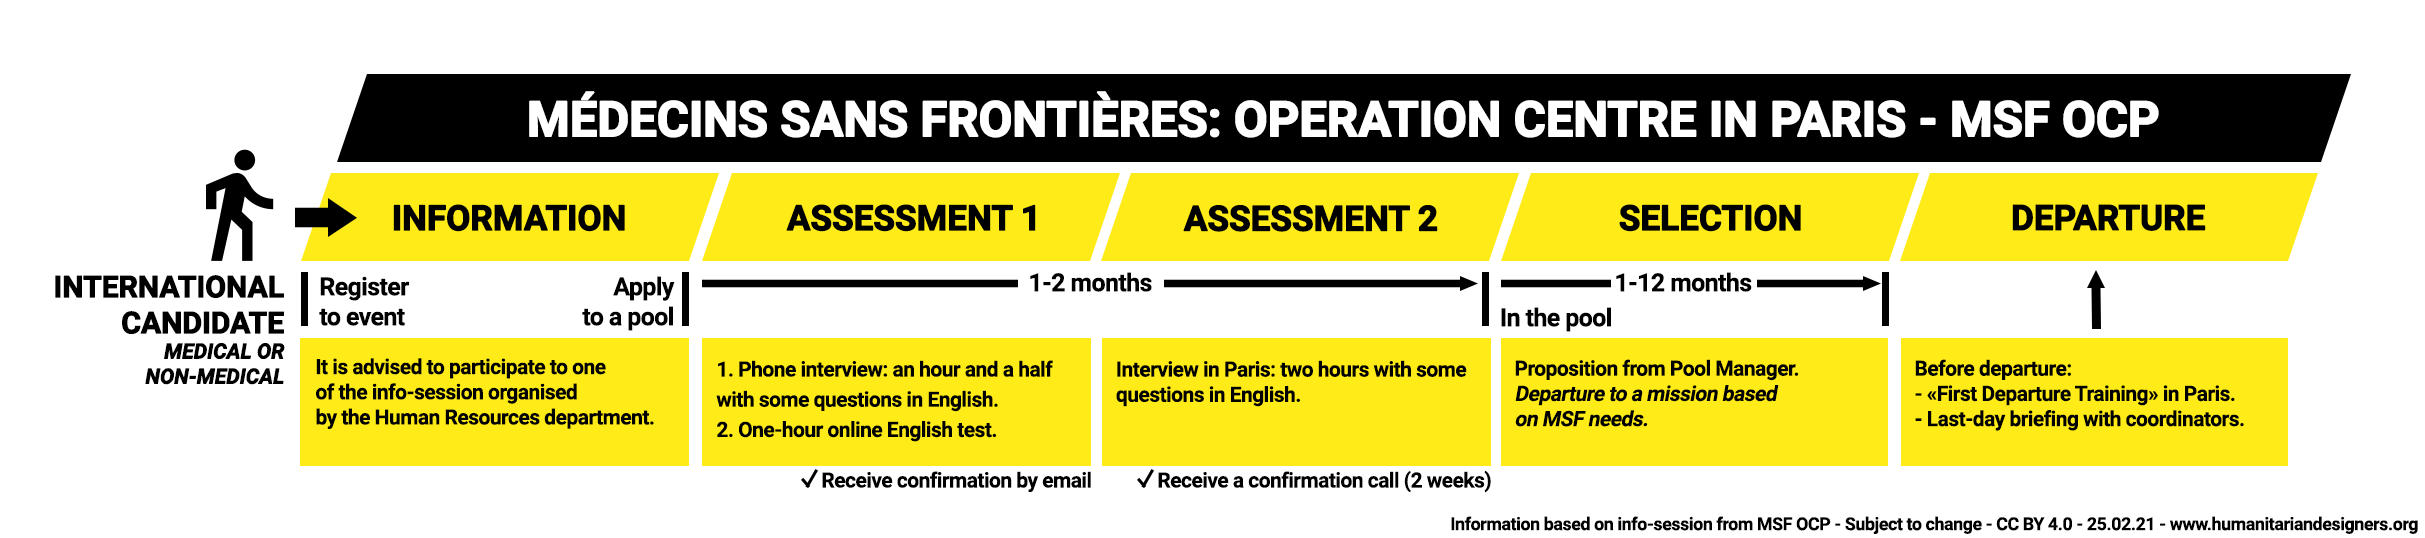 Medecins Sans Frontieres Operational Centre Paris Recruiting process MSF OCP